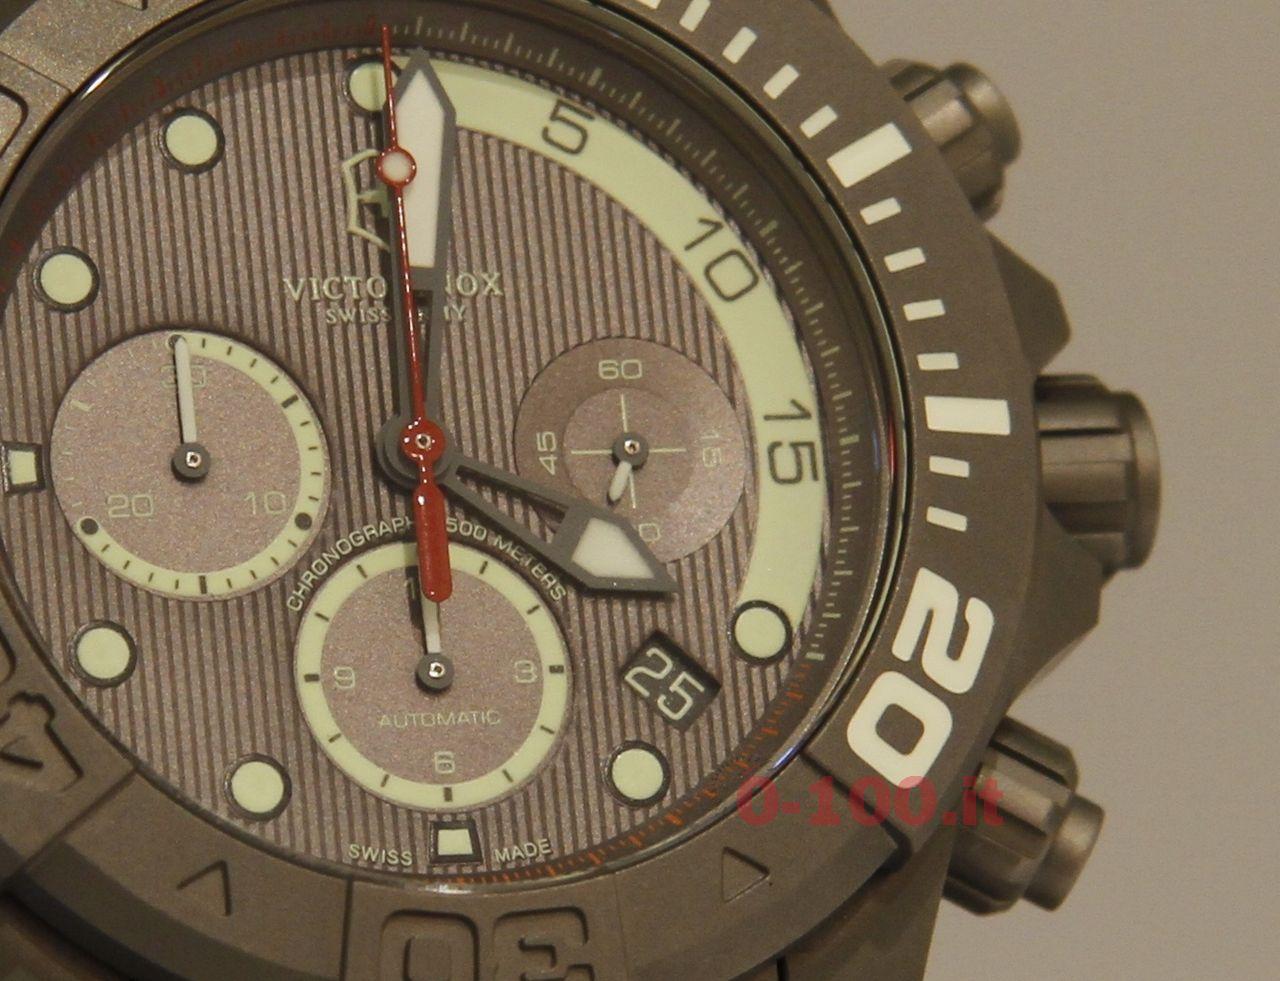 Baselworld2014_Victorinox Swiss Army_Dive_Master_500-0-1005